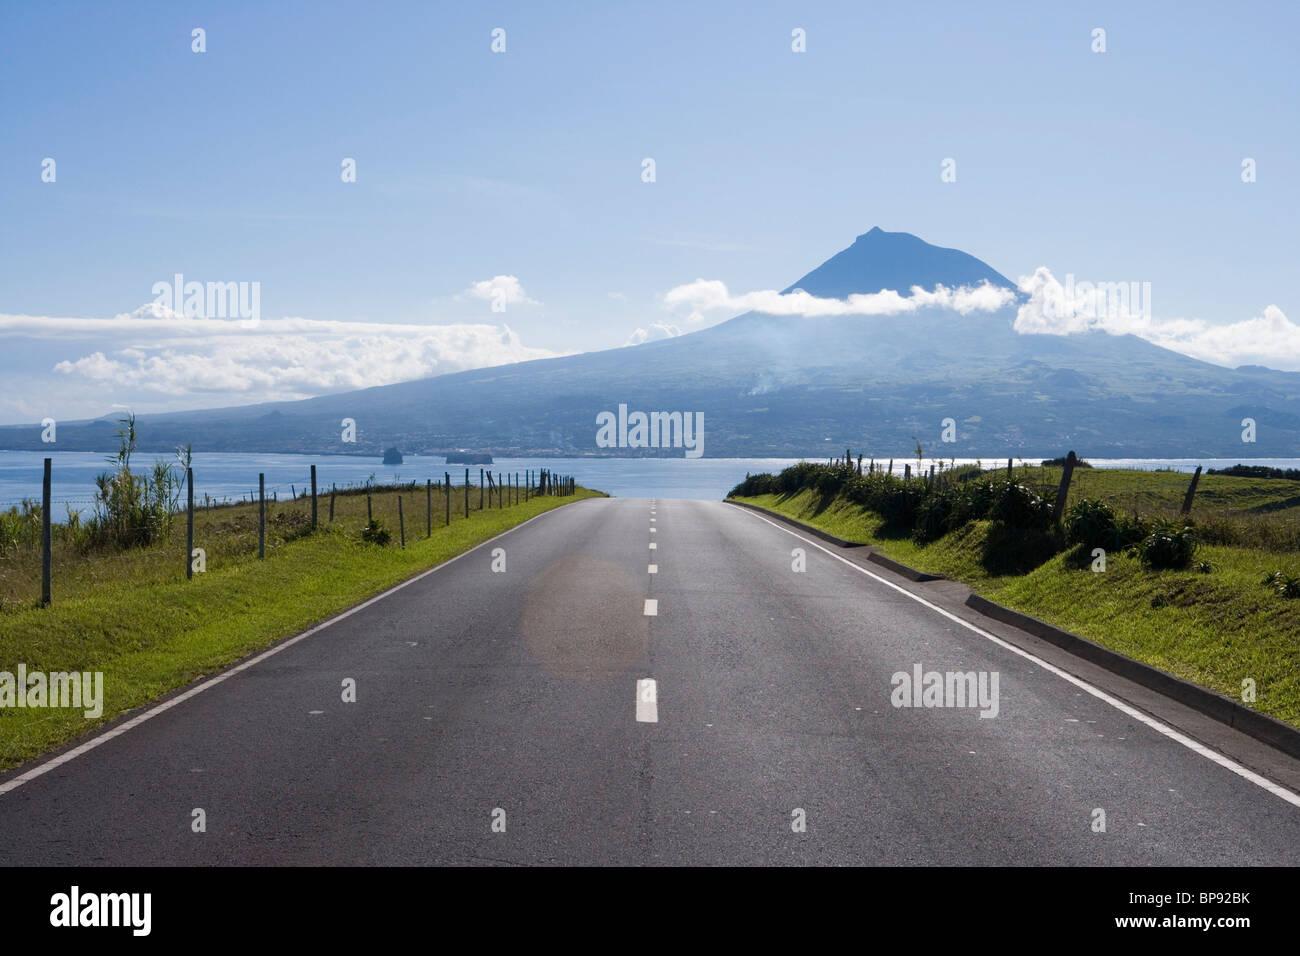 Straße mit Blick auf die Insel Pico Insel, Horta, Faial, Azoren, Portugal, Europa Stockbild